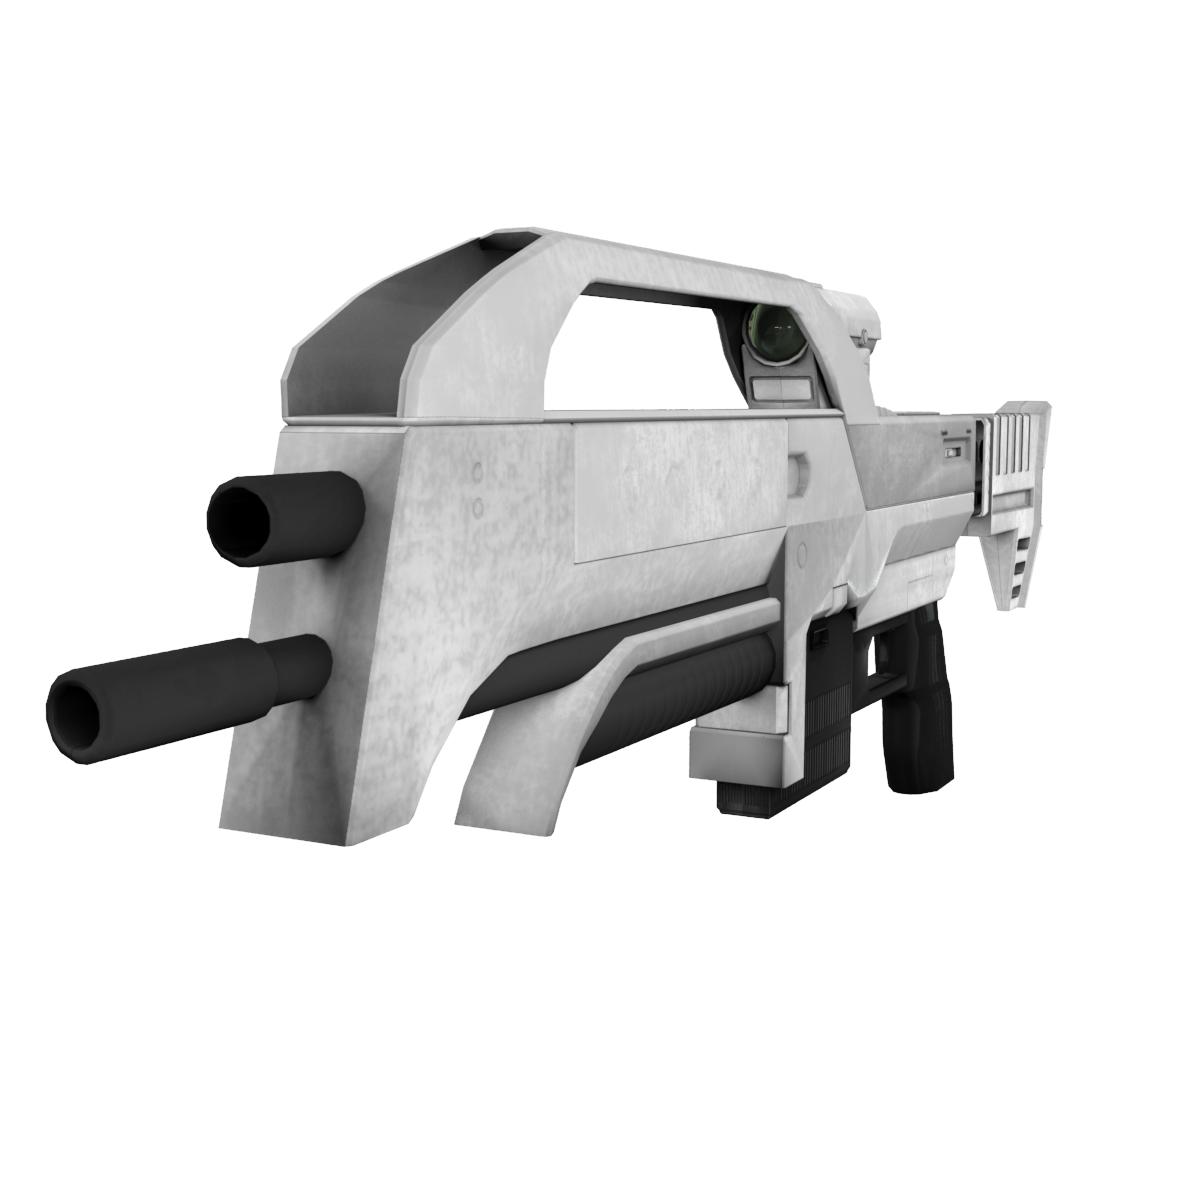 Krylov FA37 3D model